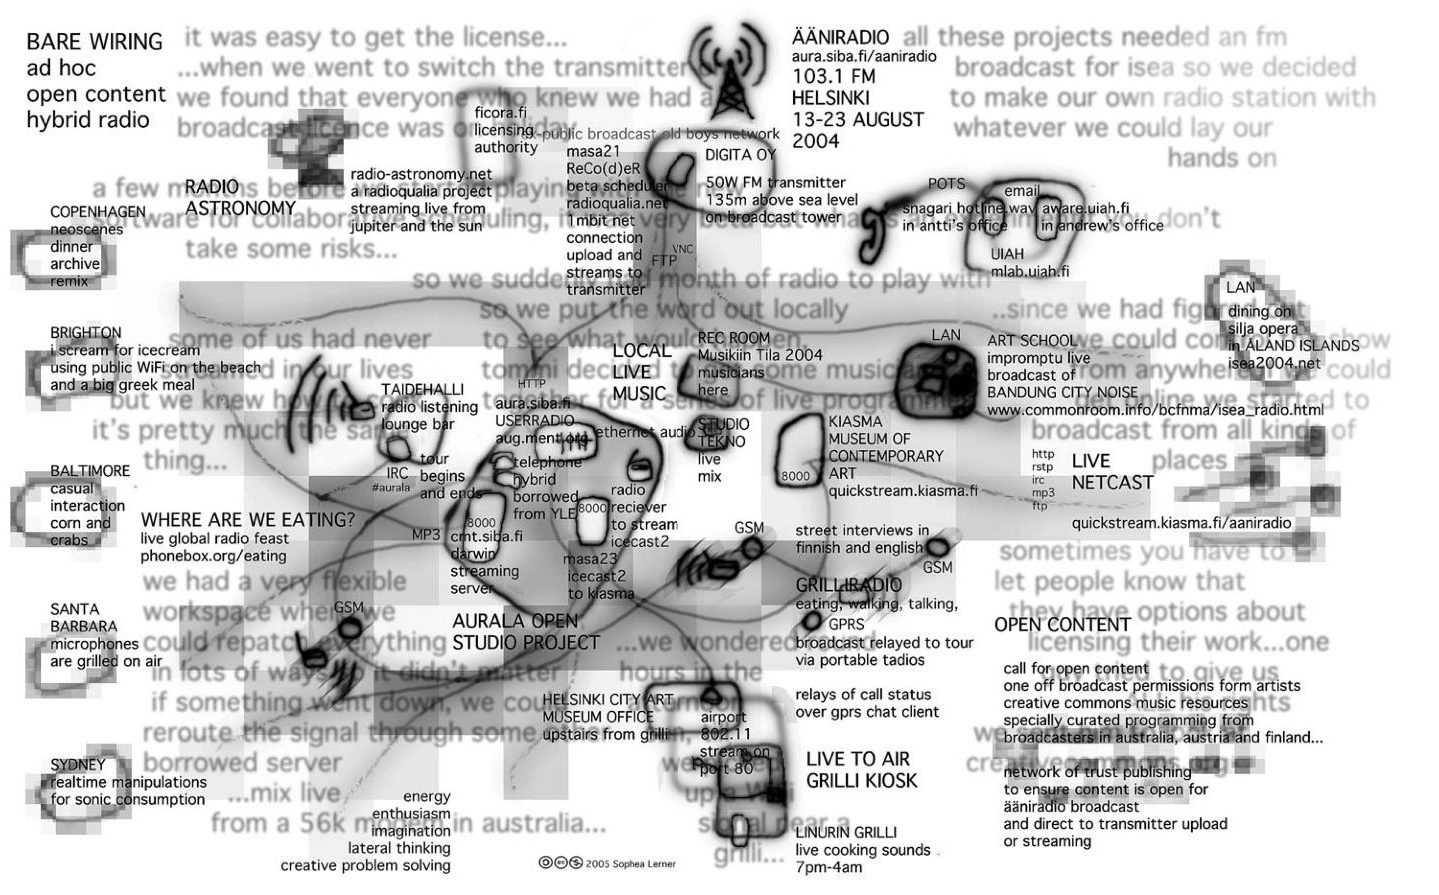 Ääniradio network diagram with notes